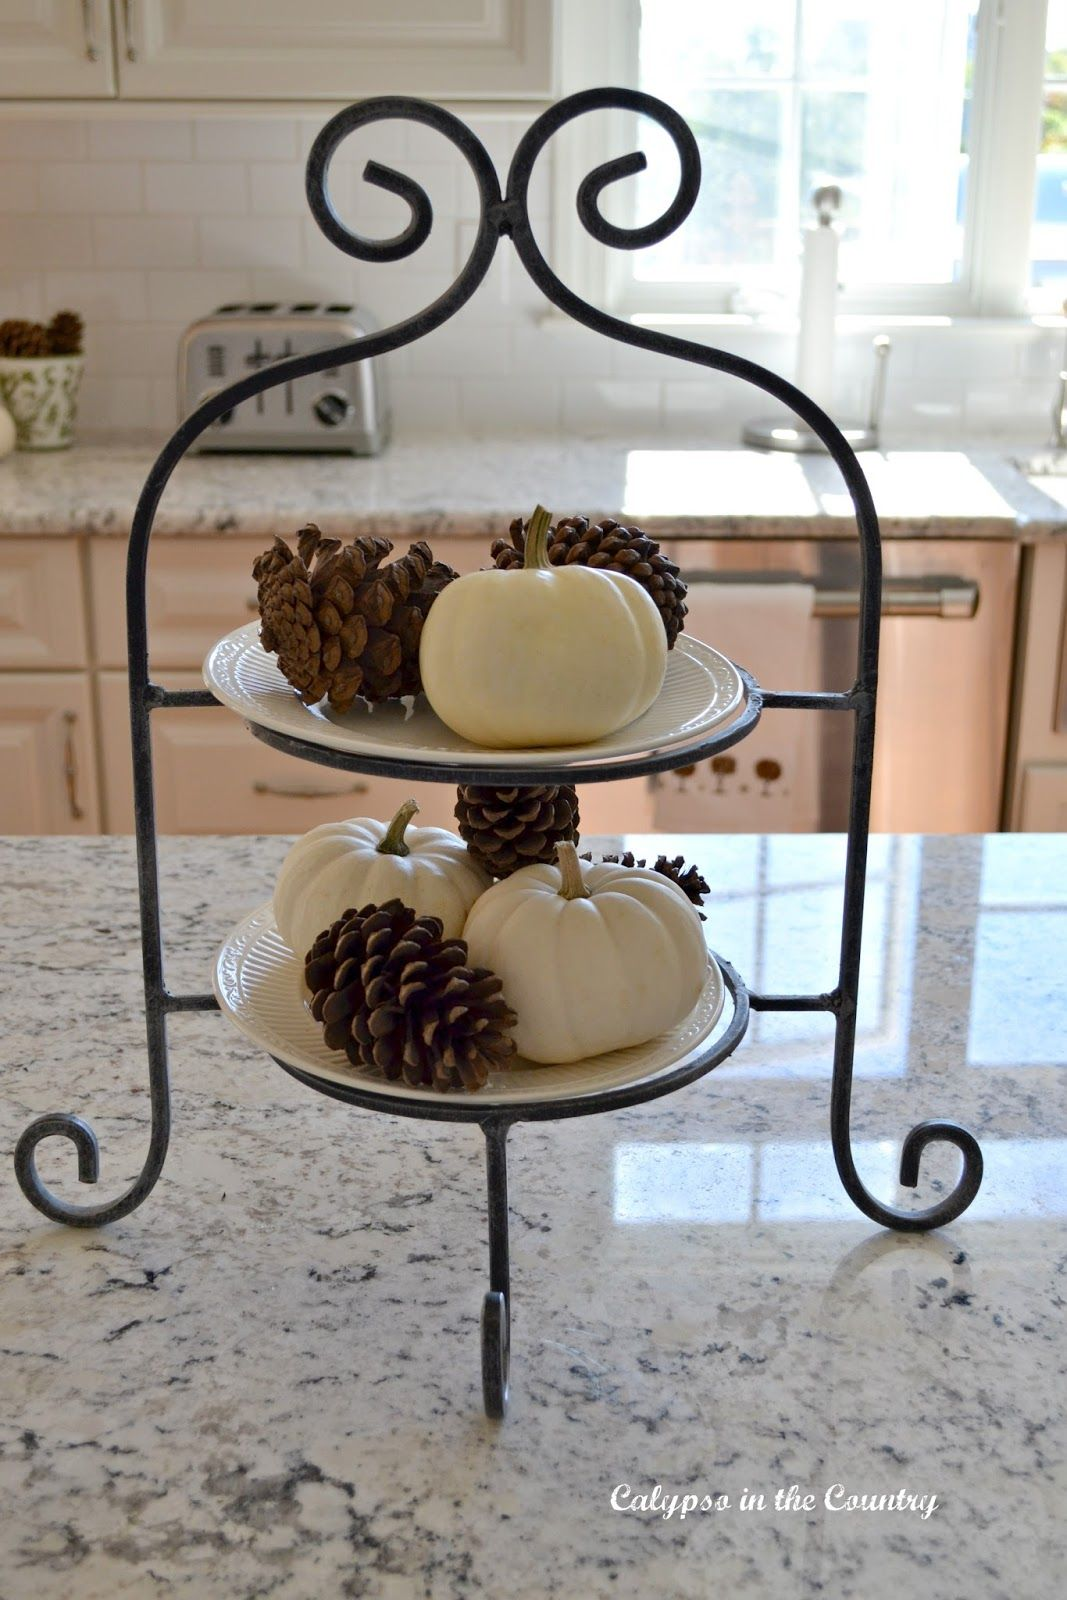 Autumn Table and White Pumpkin Vignettes. White PumpkinsPlate StandsIron WorkWrought ... & Autumn Table and White Pumpkin Vignettes | Plate stands Wrought ...